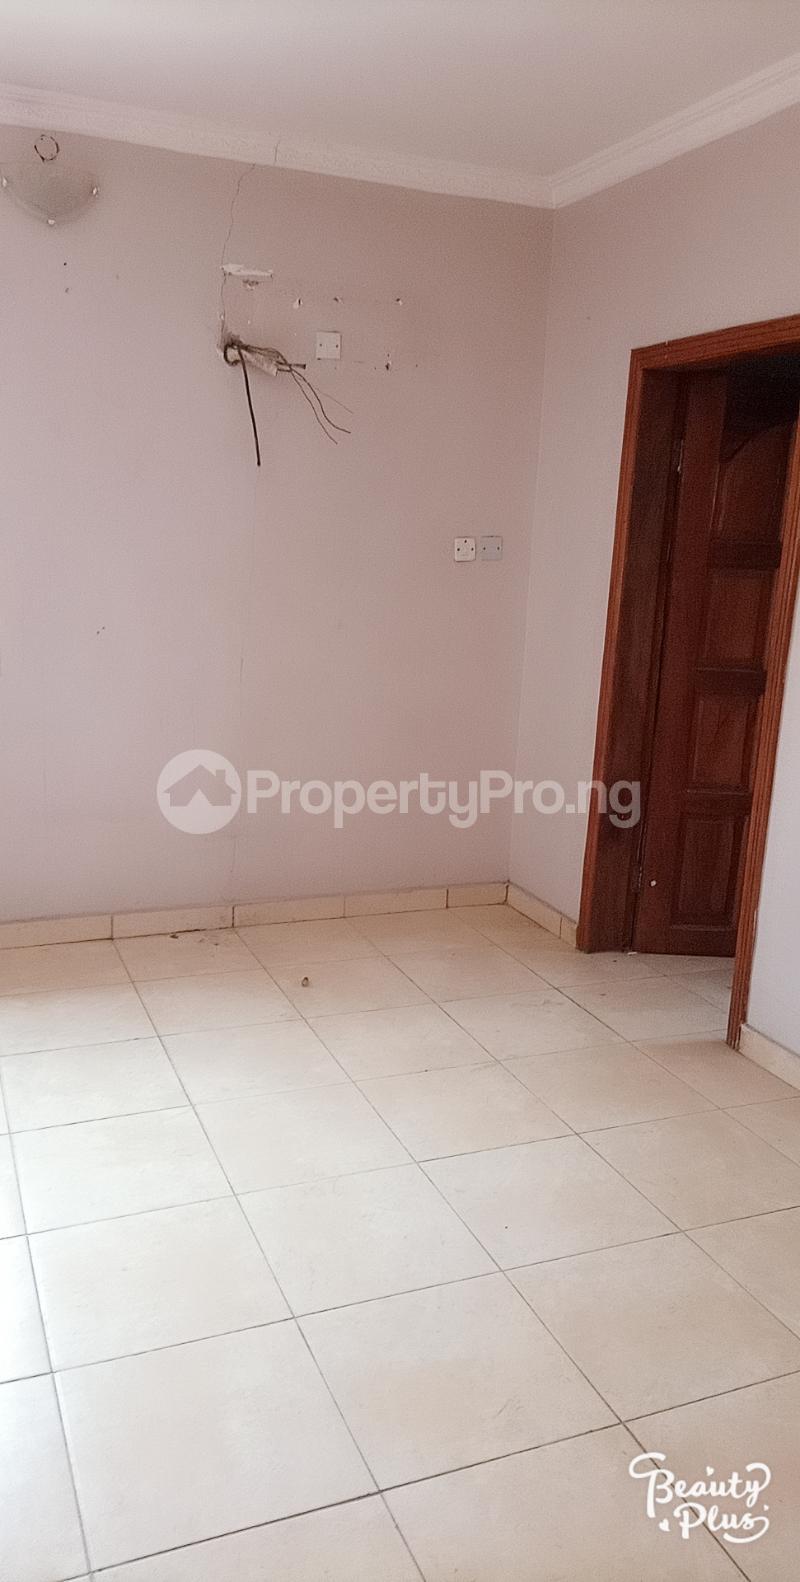 5 bedroom Detached Duplex House for sale Ajao Estate Isolo. Lagos Mainland Ajao Estate Isolo Lagos - 7